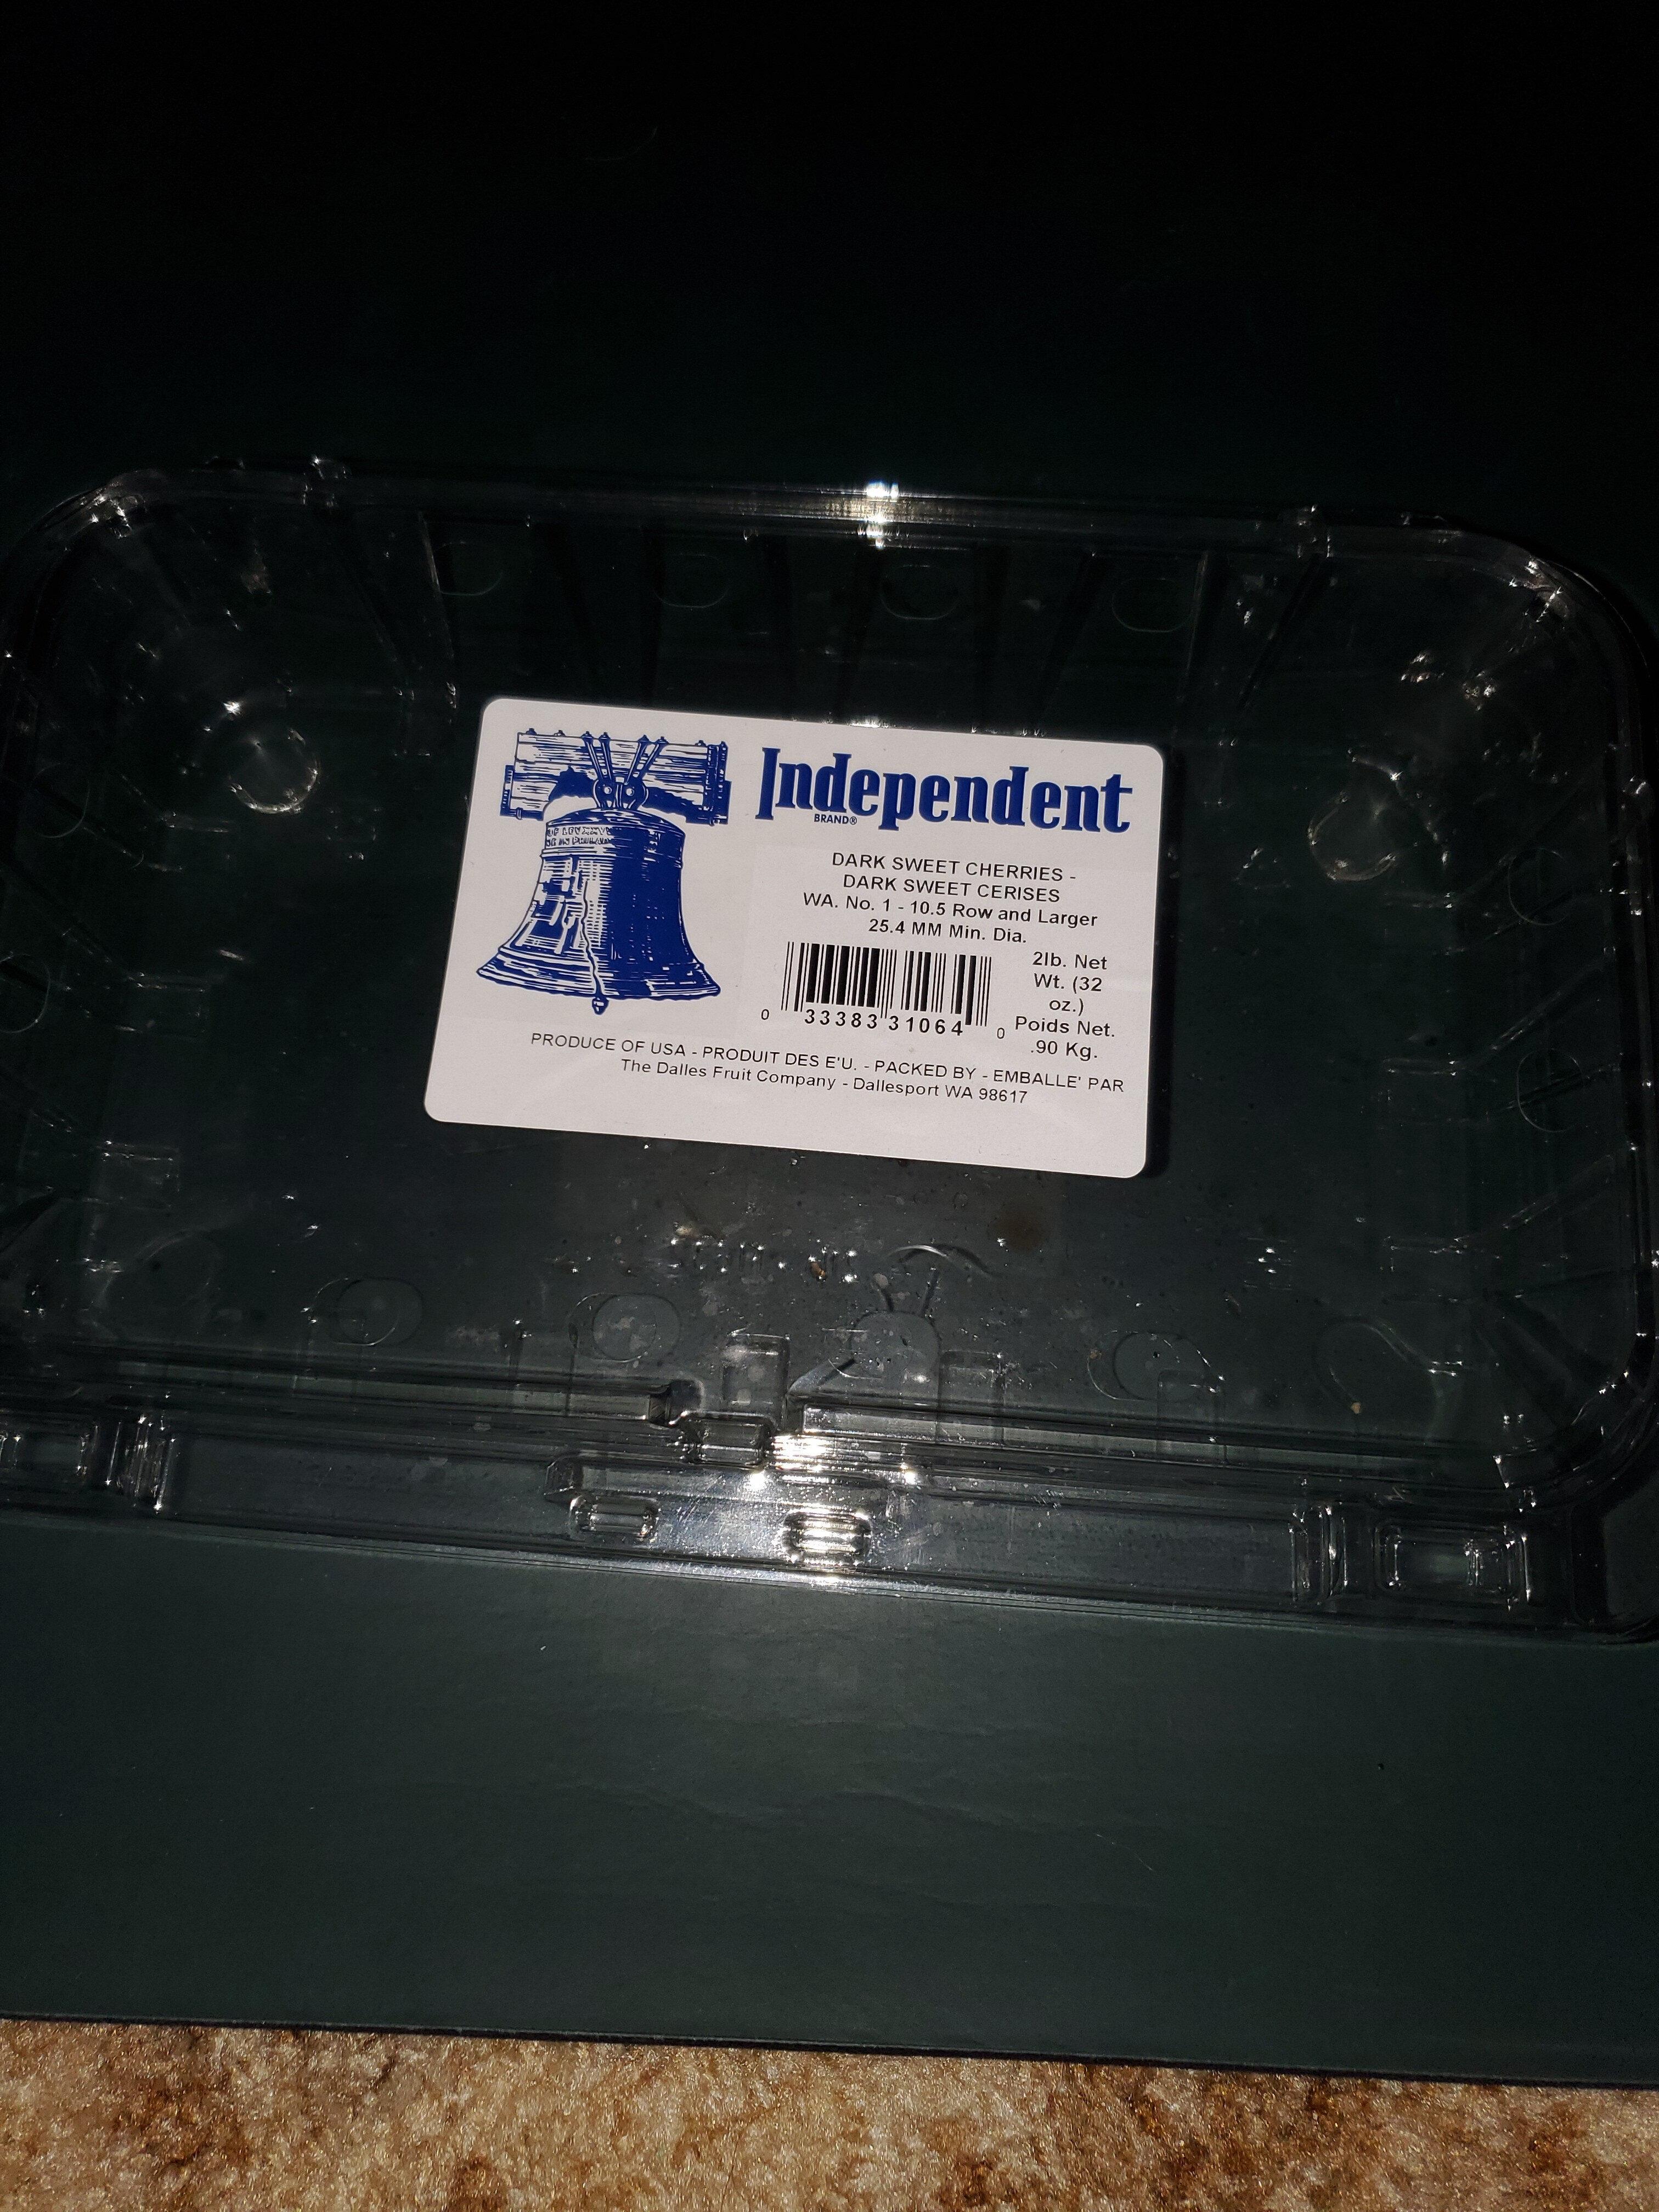 Dark Sweet Cherries - Product